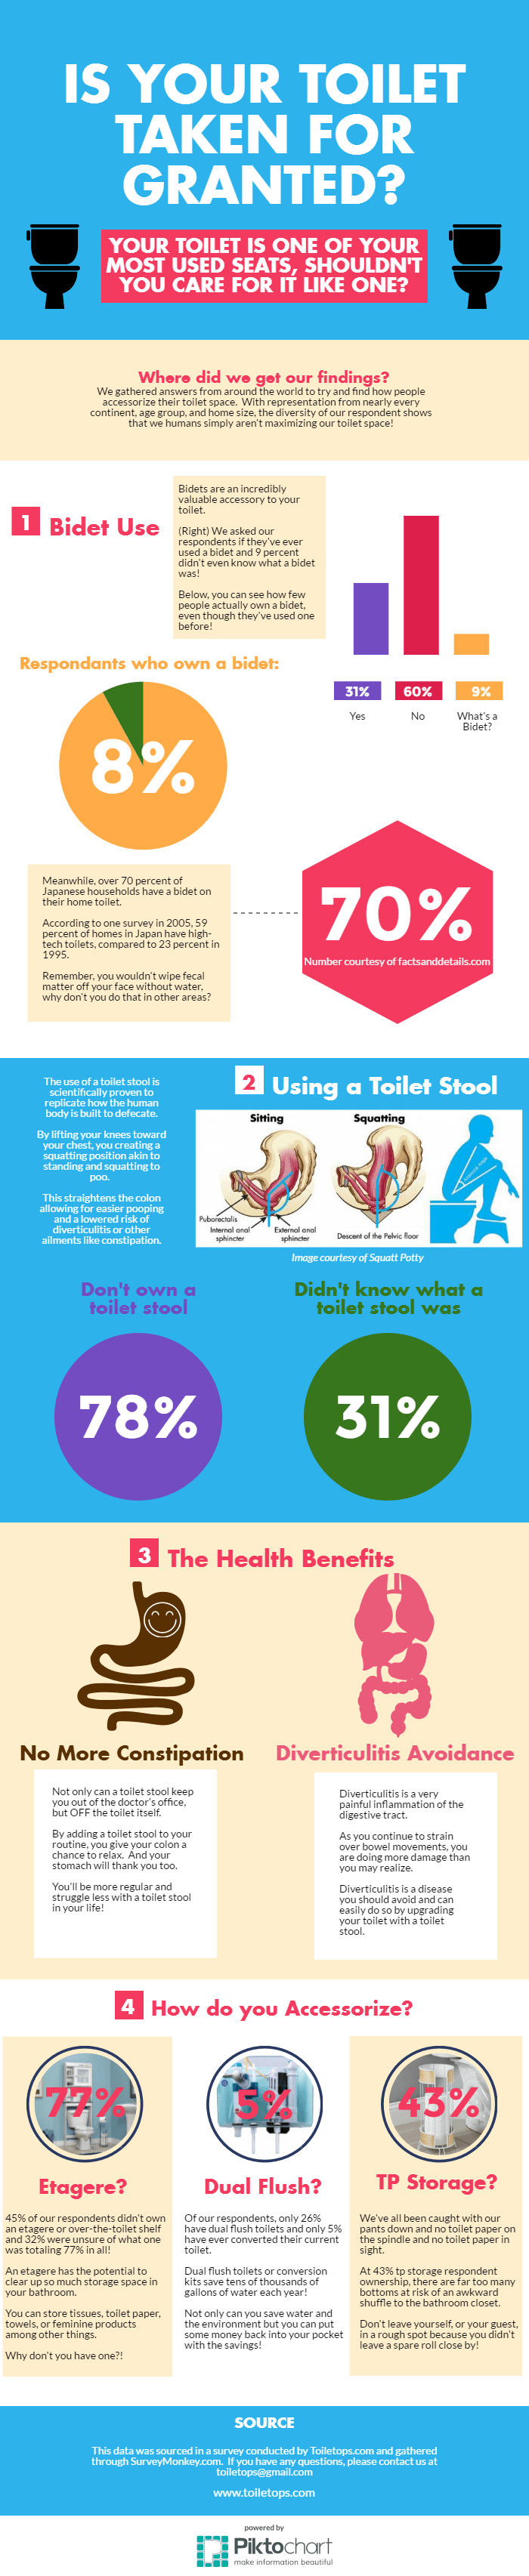 toilet accessories Toiletops.com infographic